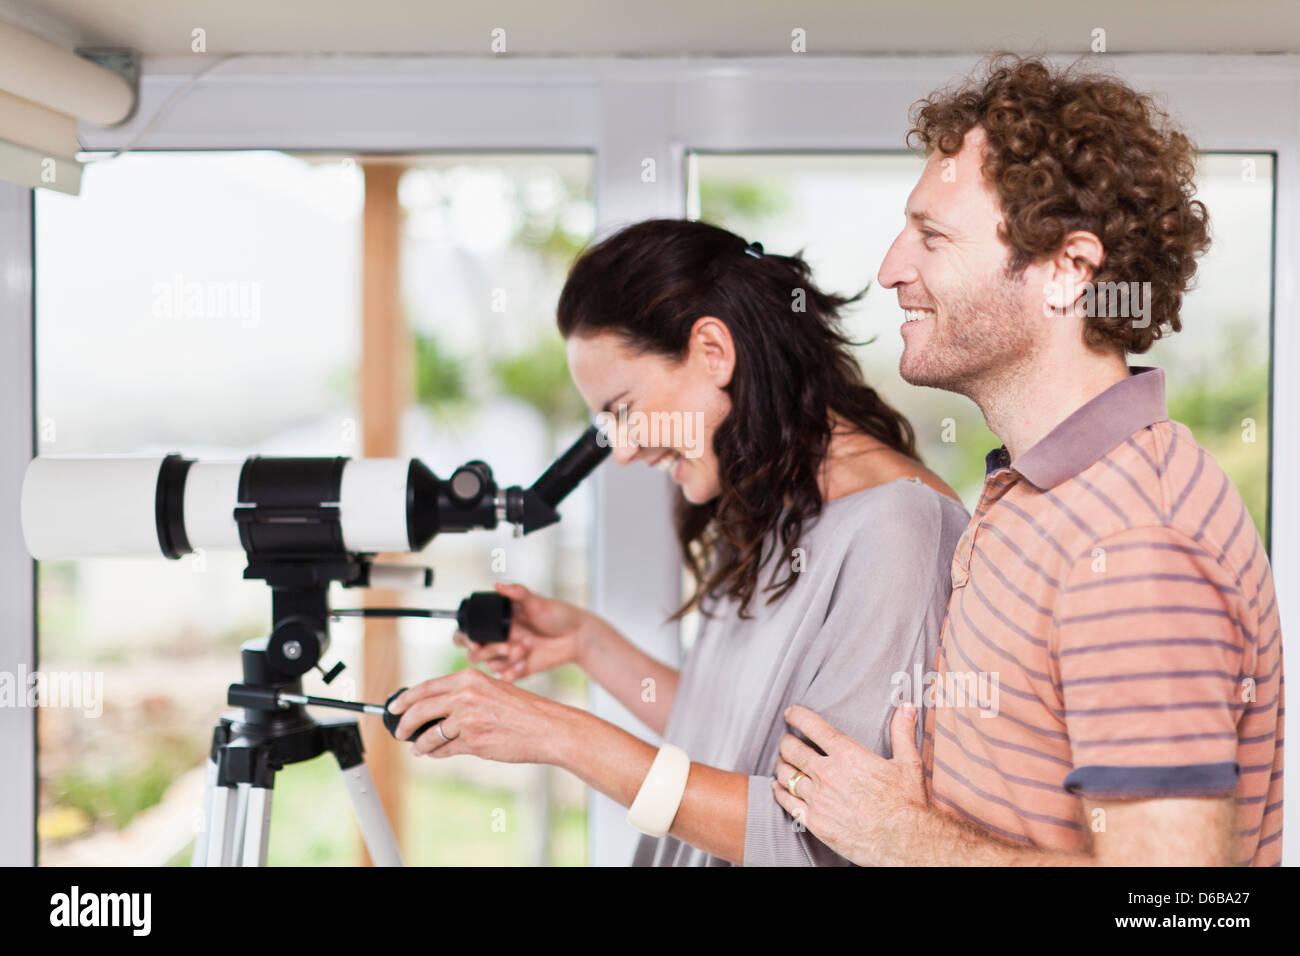 Woman using boyfriends telescope - Stock Image